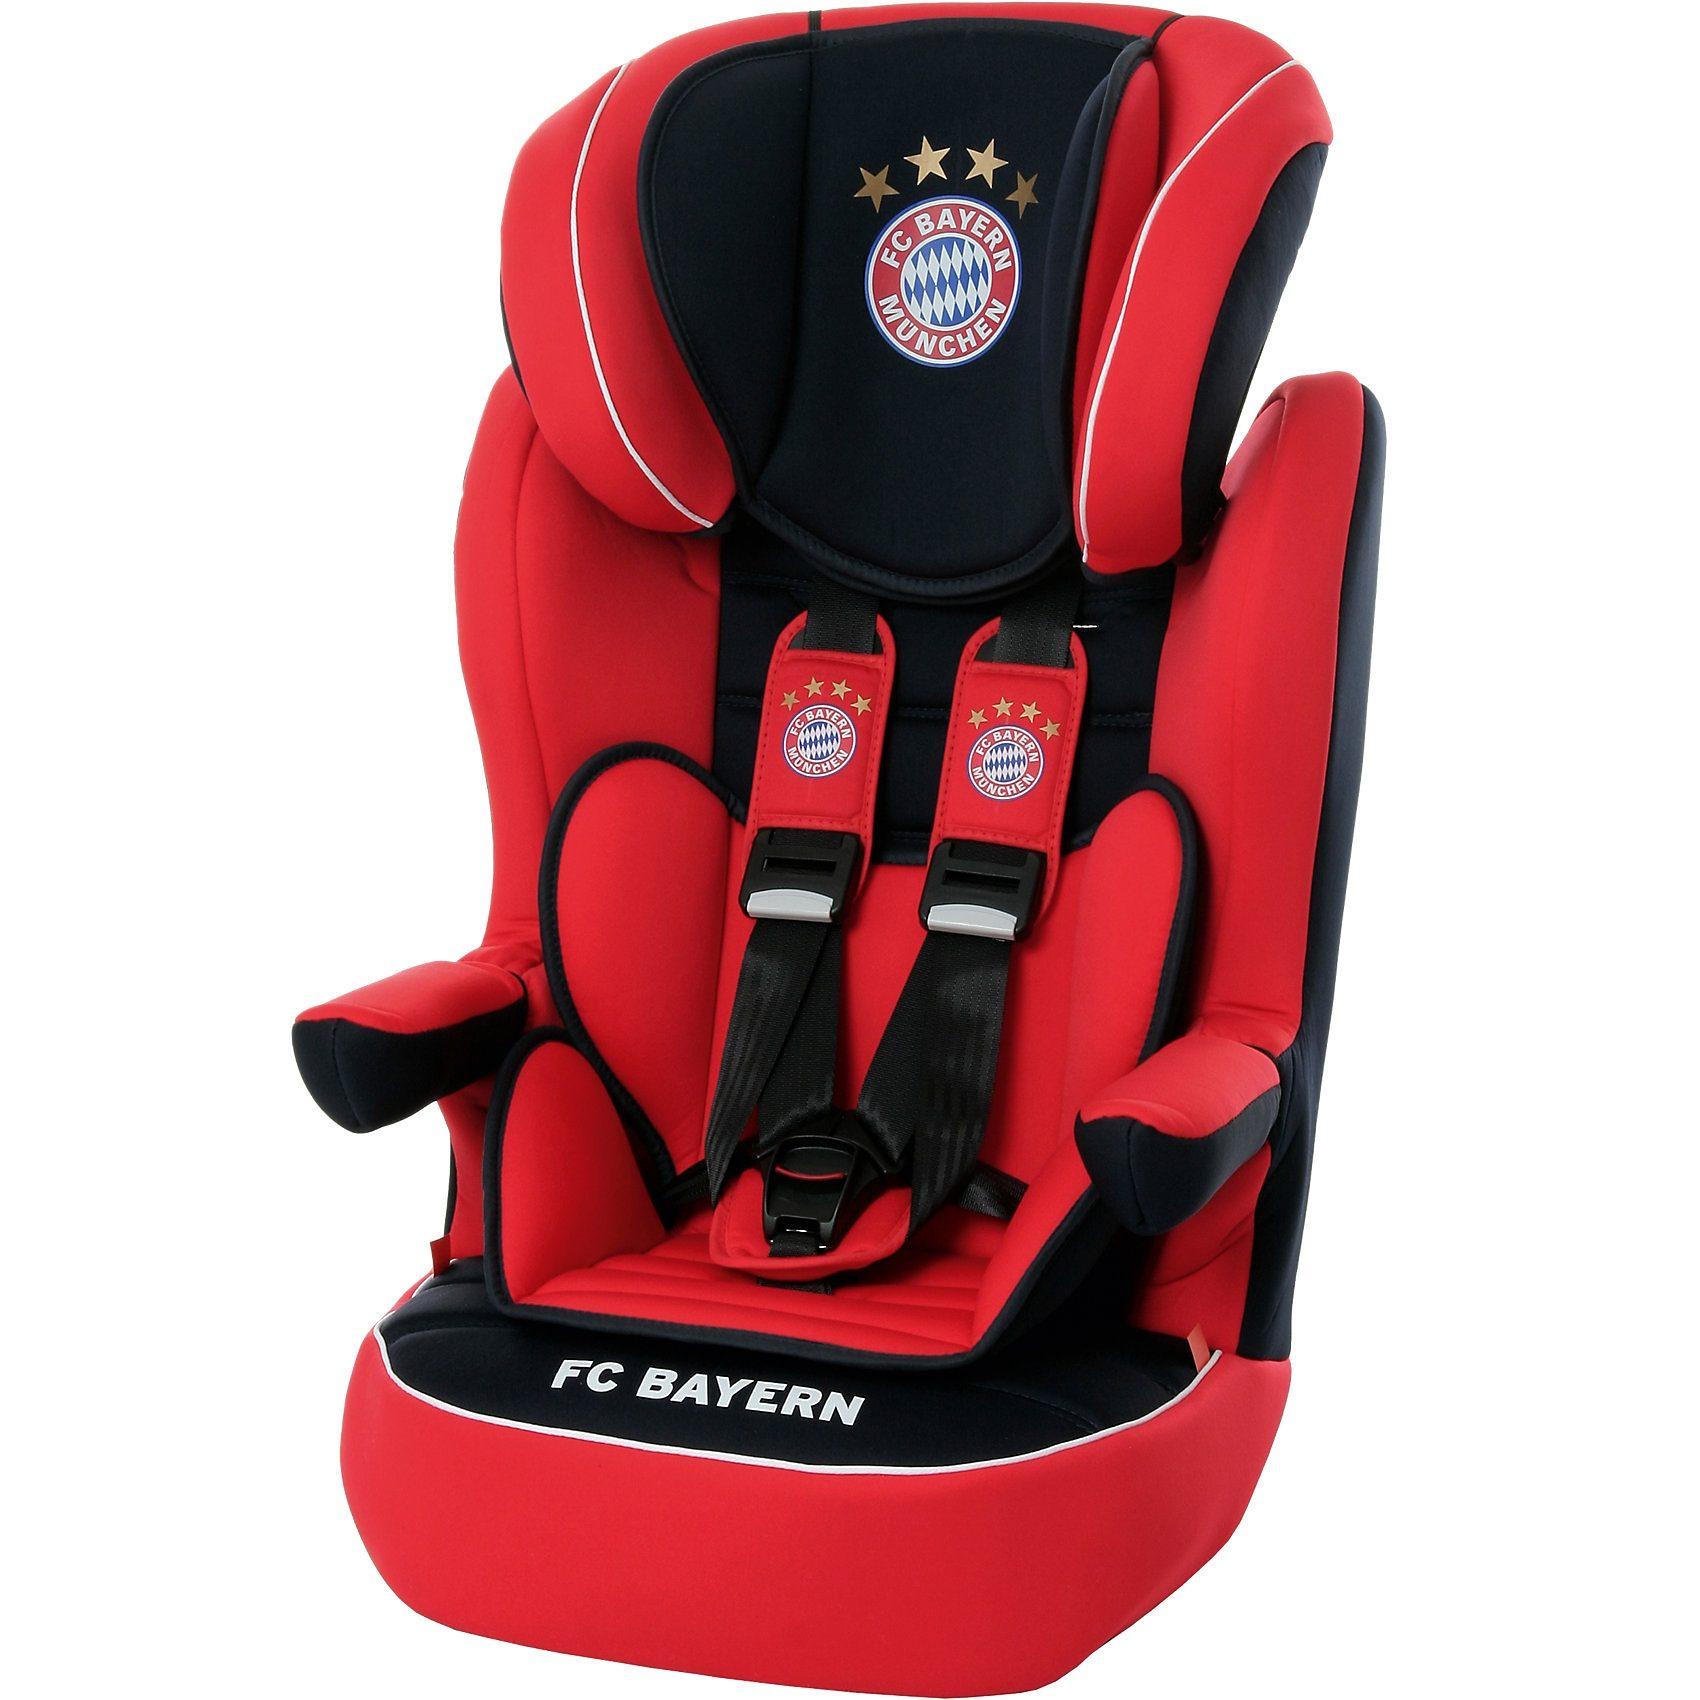 Osann Auto-Kindersitz Comet, FC Bayern München, 2017